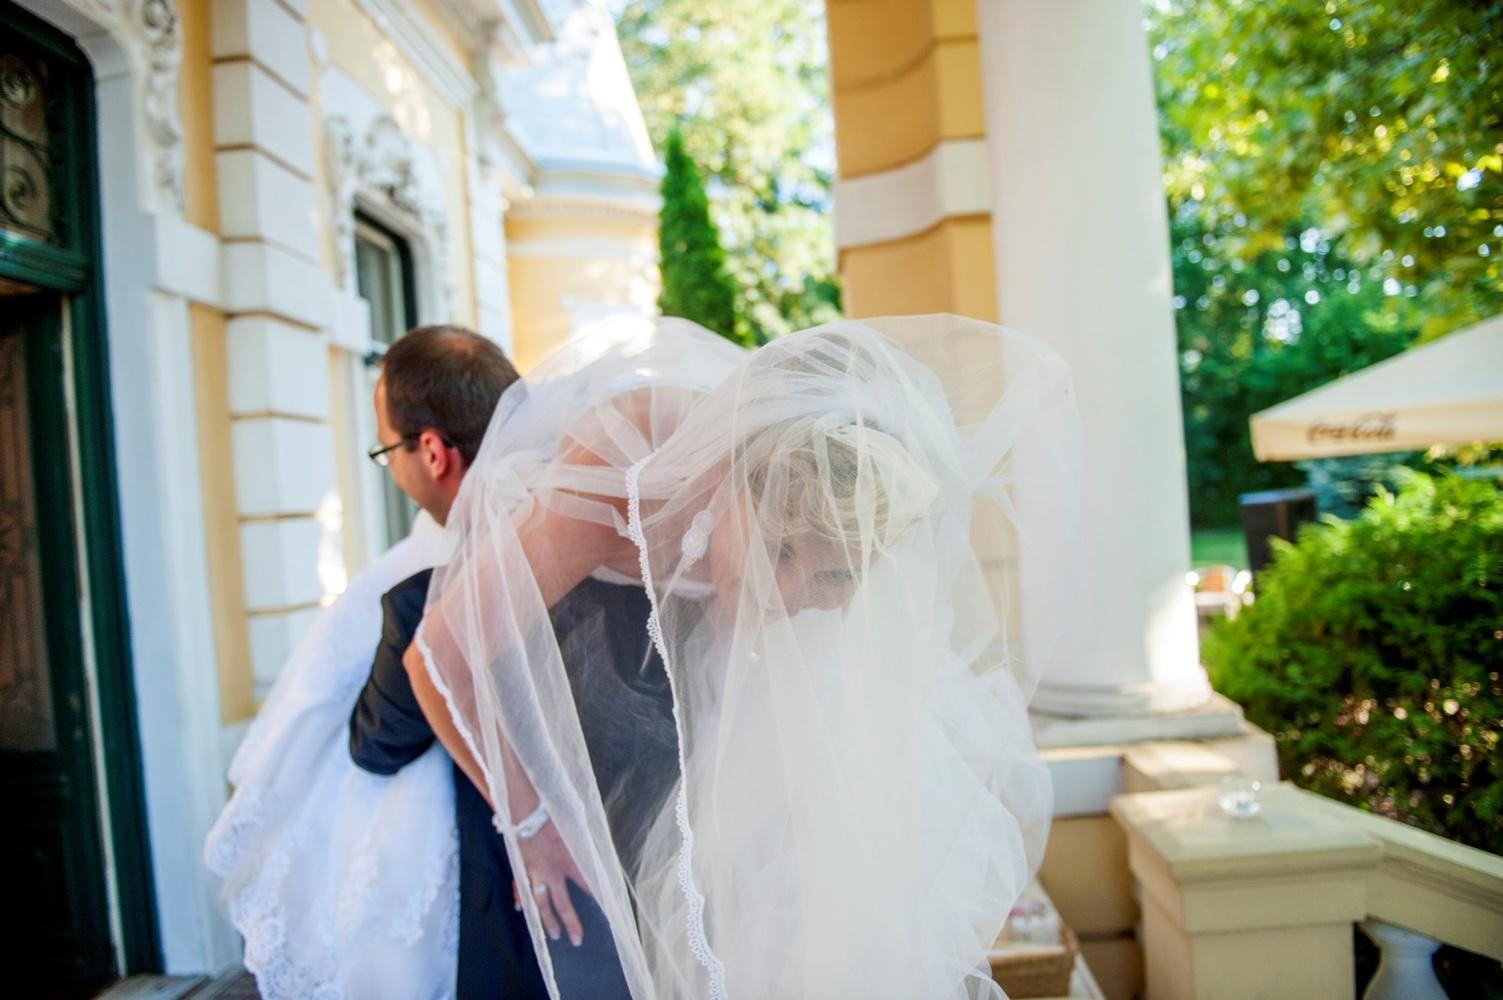 http://www.fotoz.sk/images/gallery-17/normal/eskuvoi-fotozas_svadobne-fotenie_099.jpg